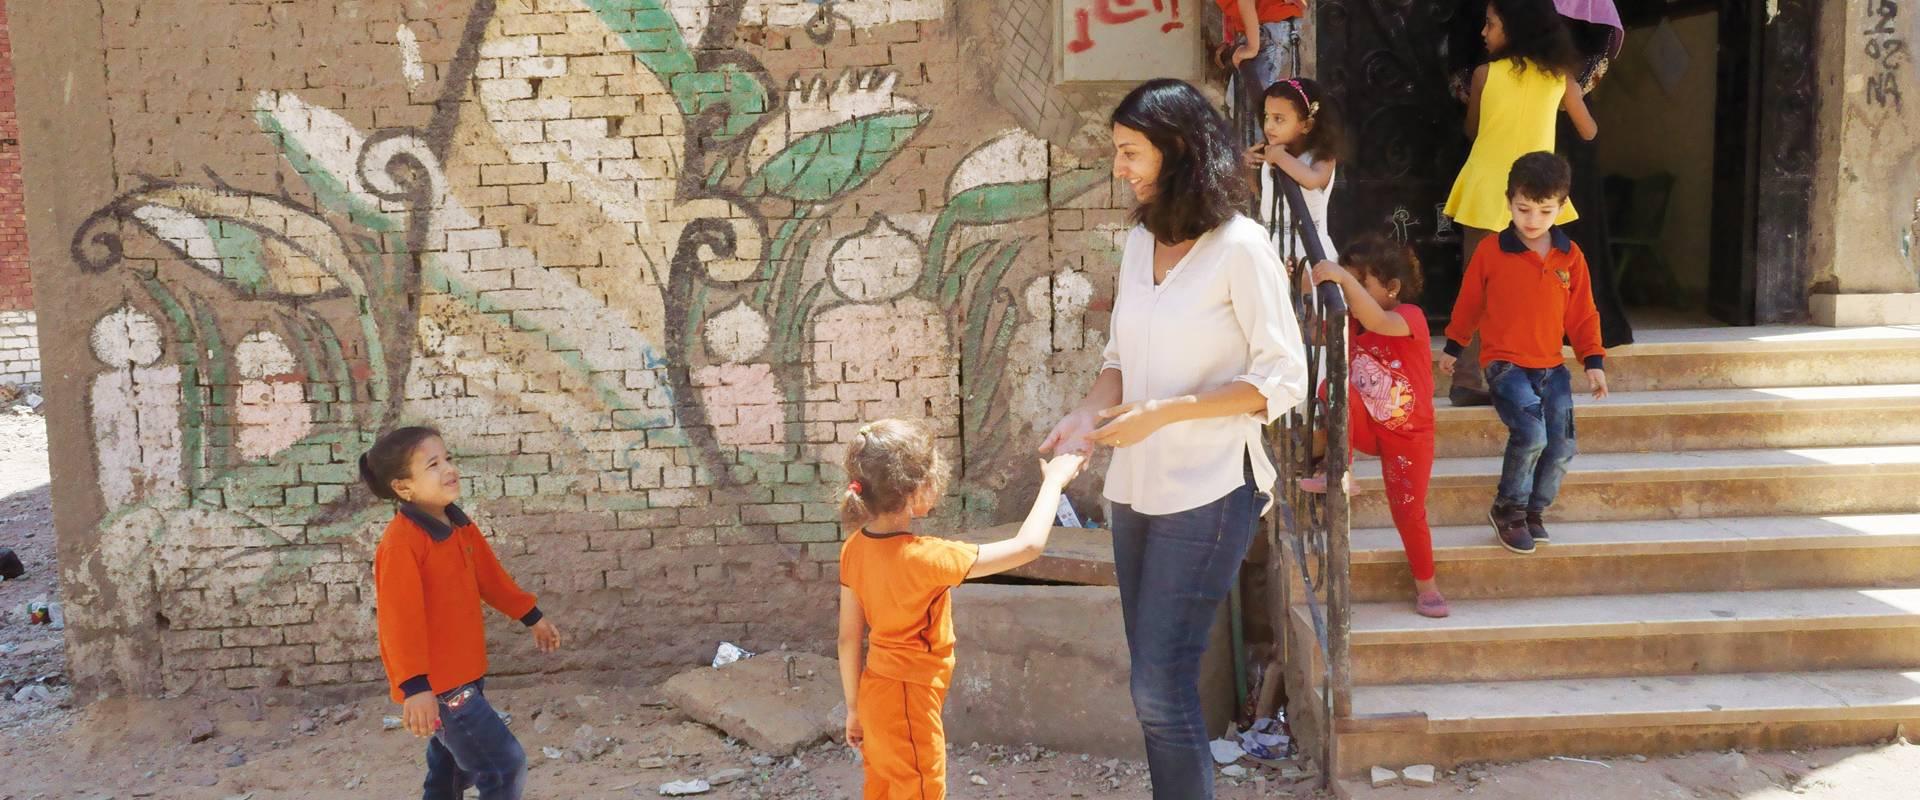 A community school in Cairo